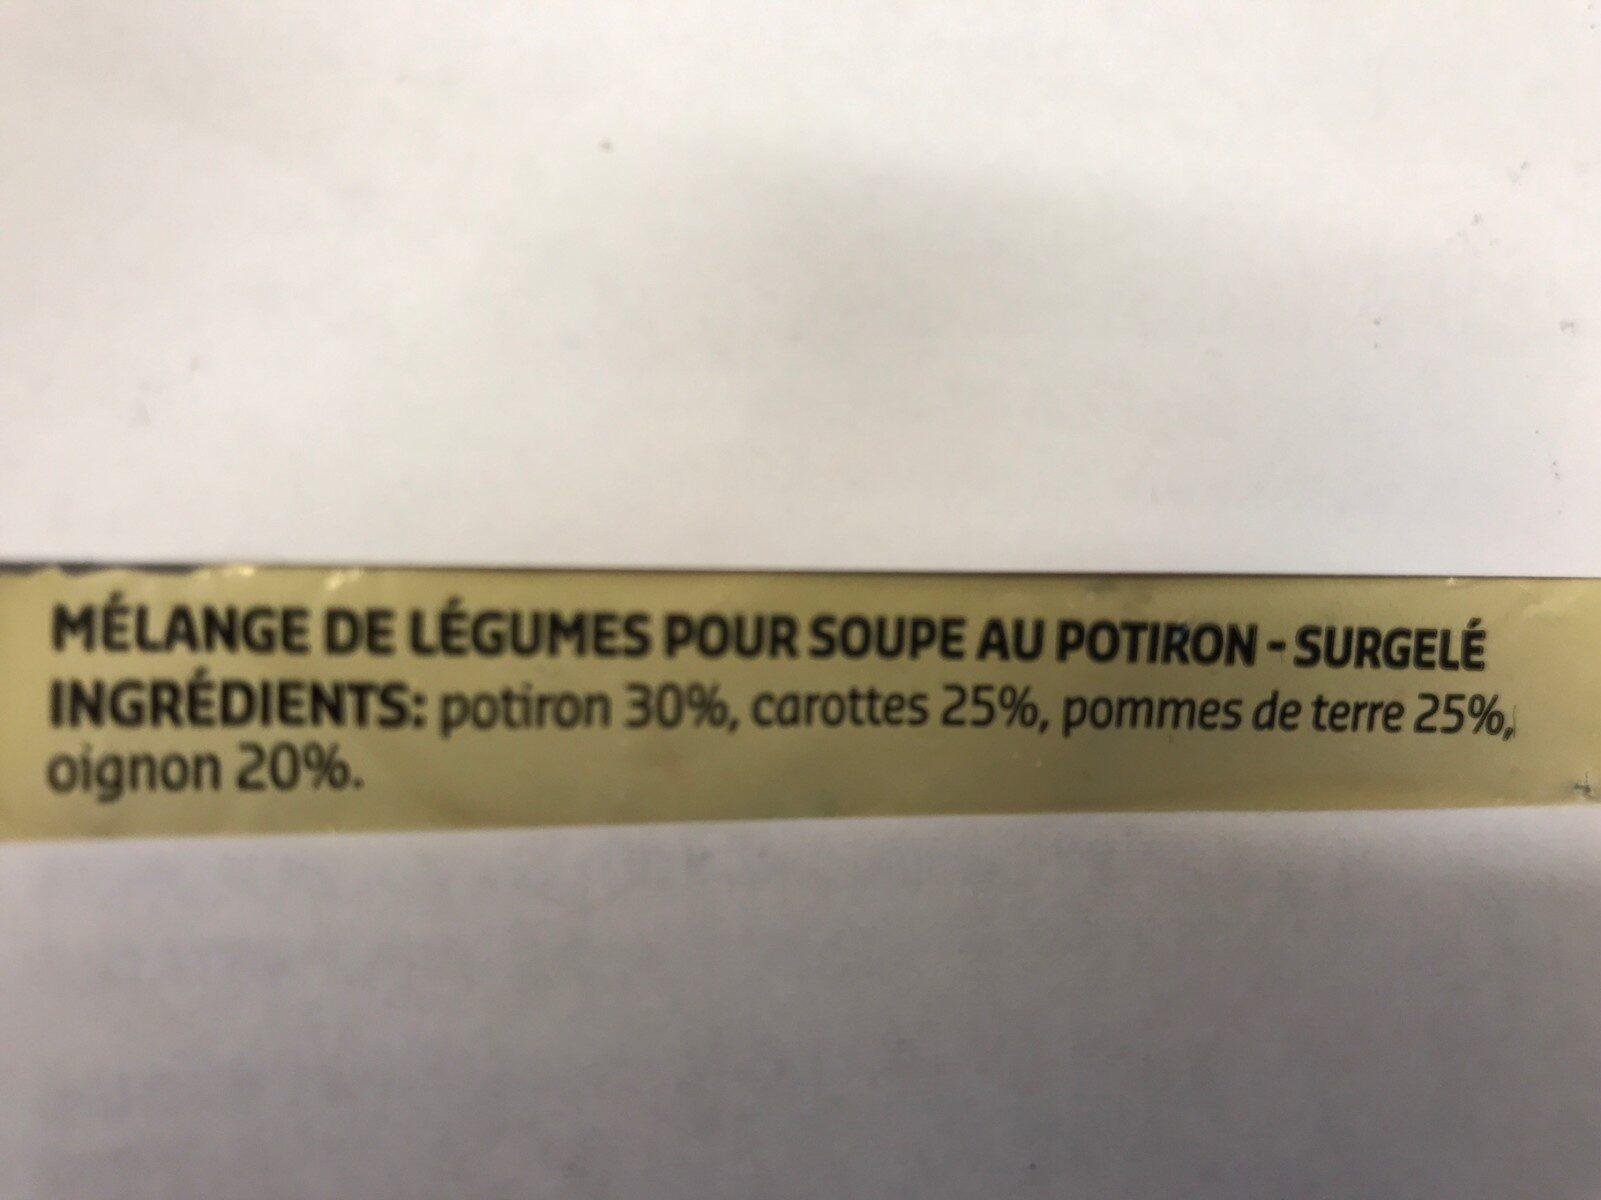 Mélange de légumes pour soupe au potiron - Ingrediënten